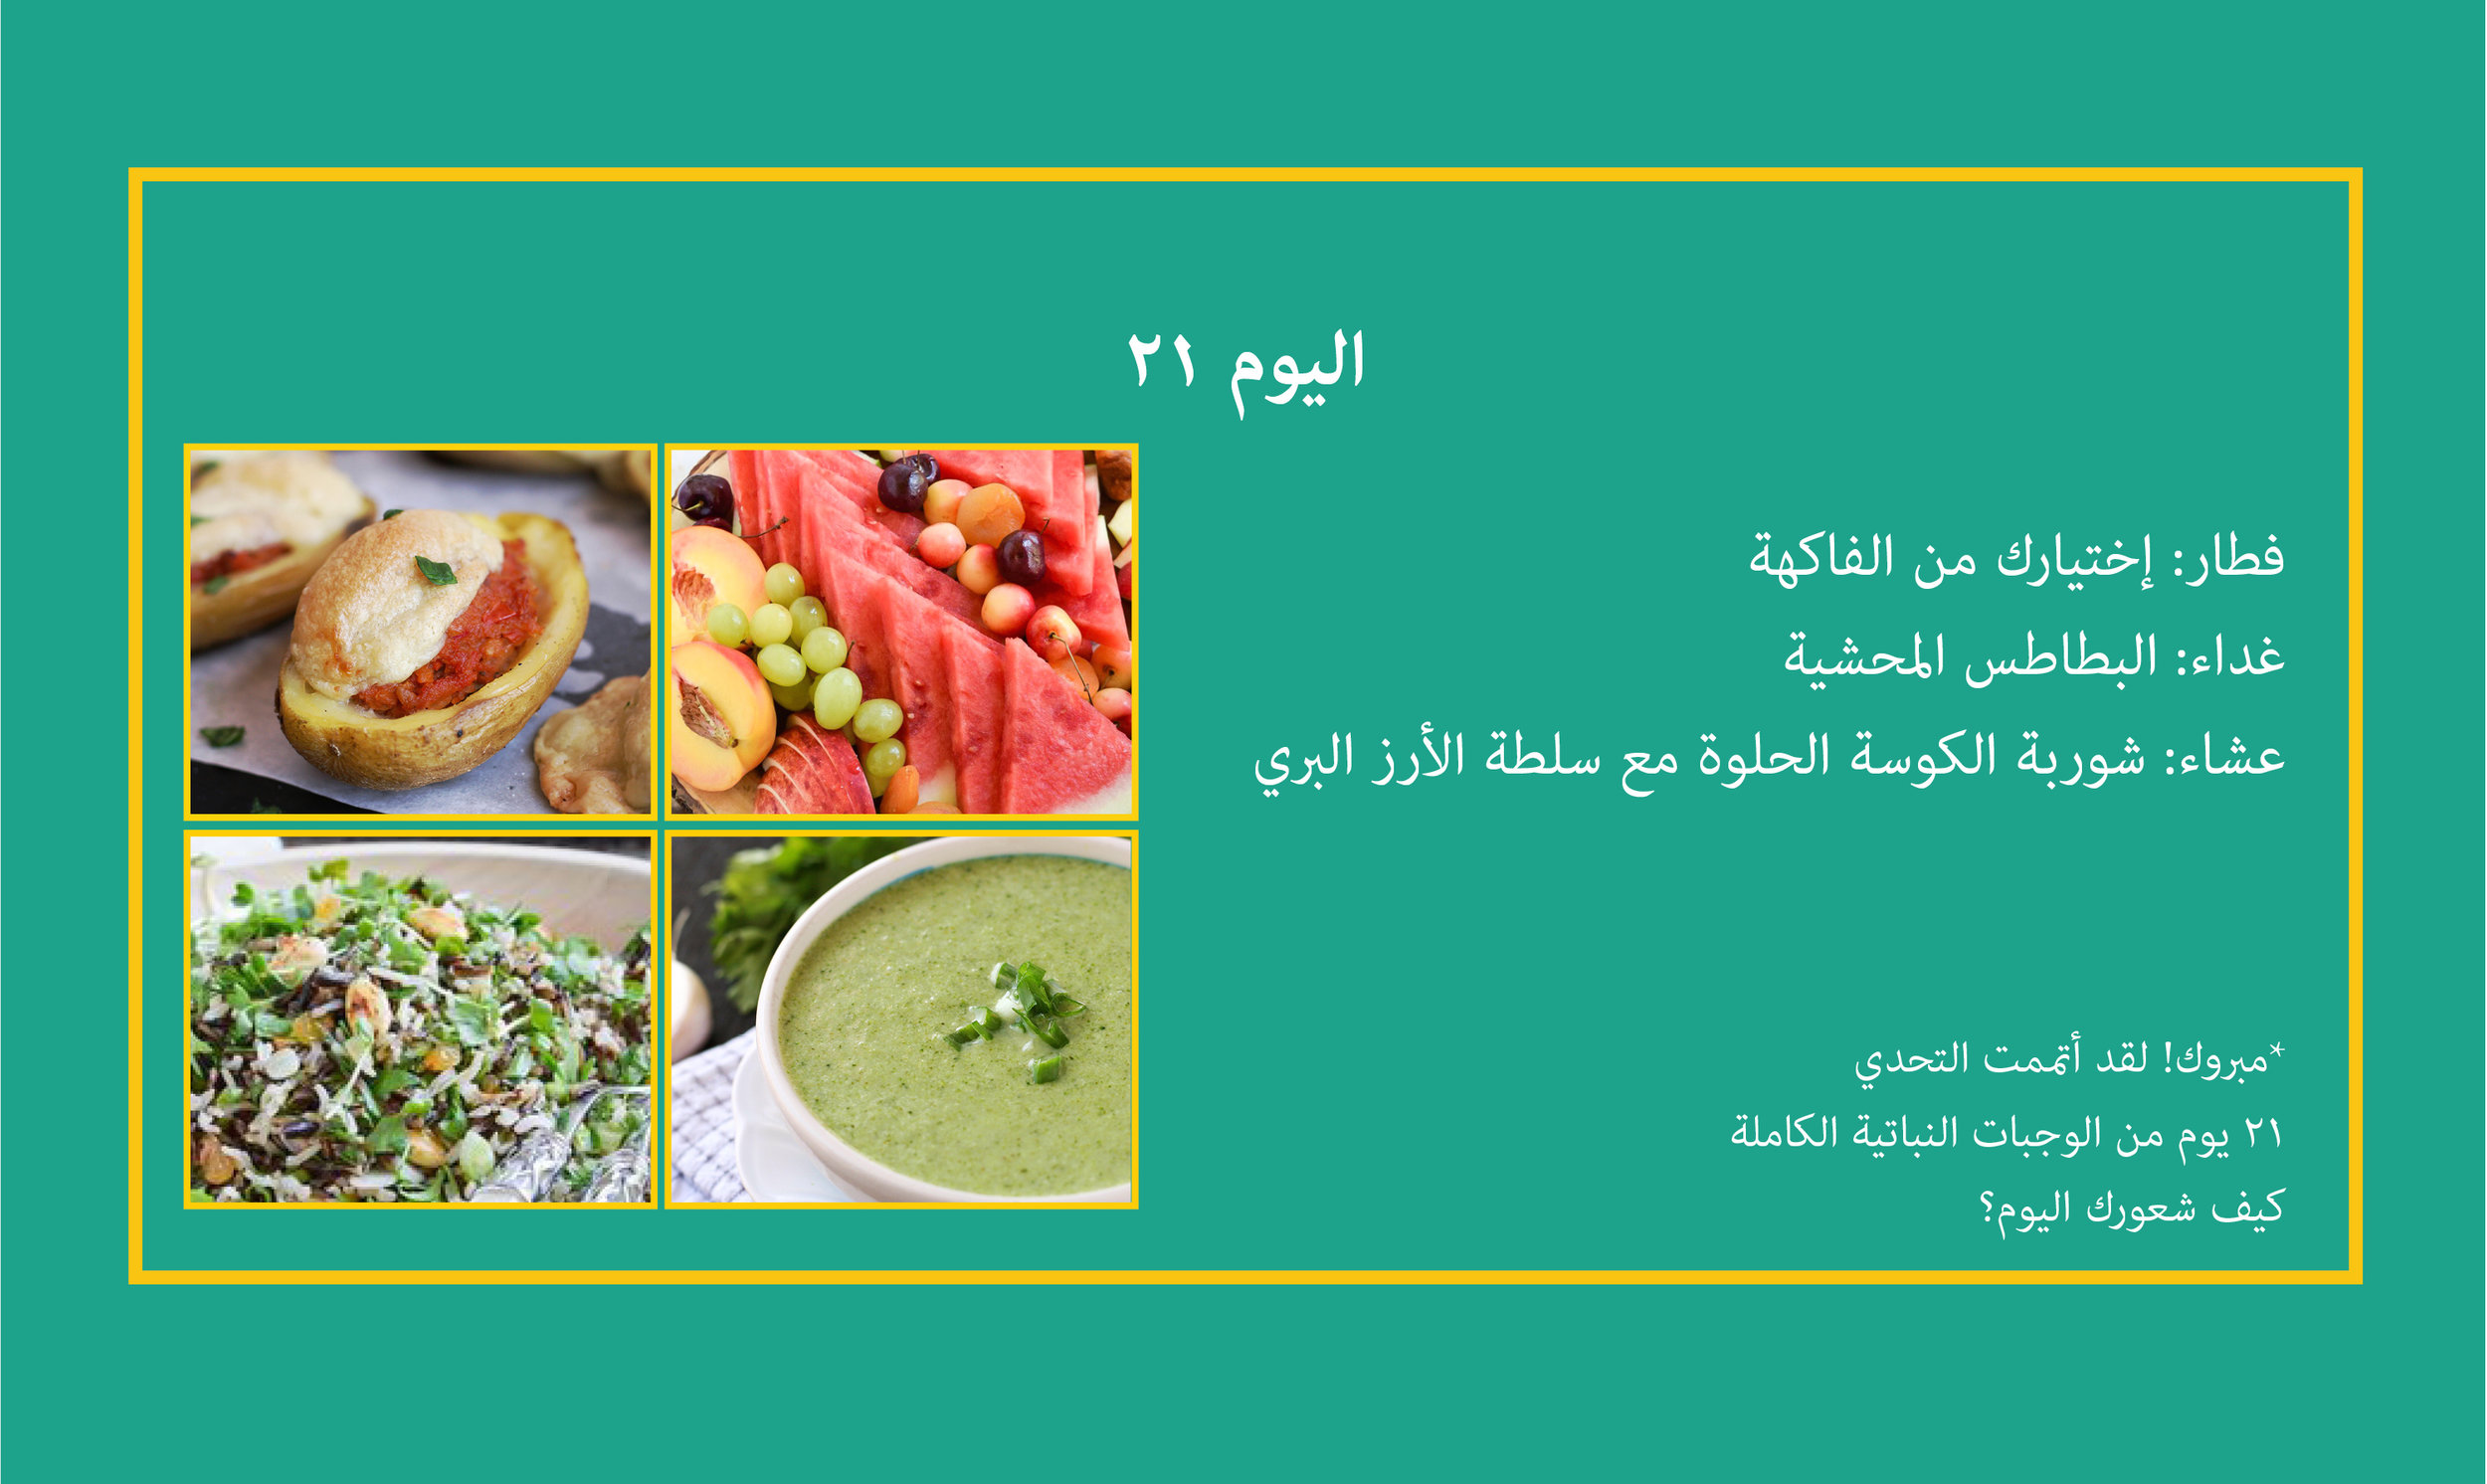 Day 21 Arabic.jpg